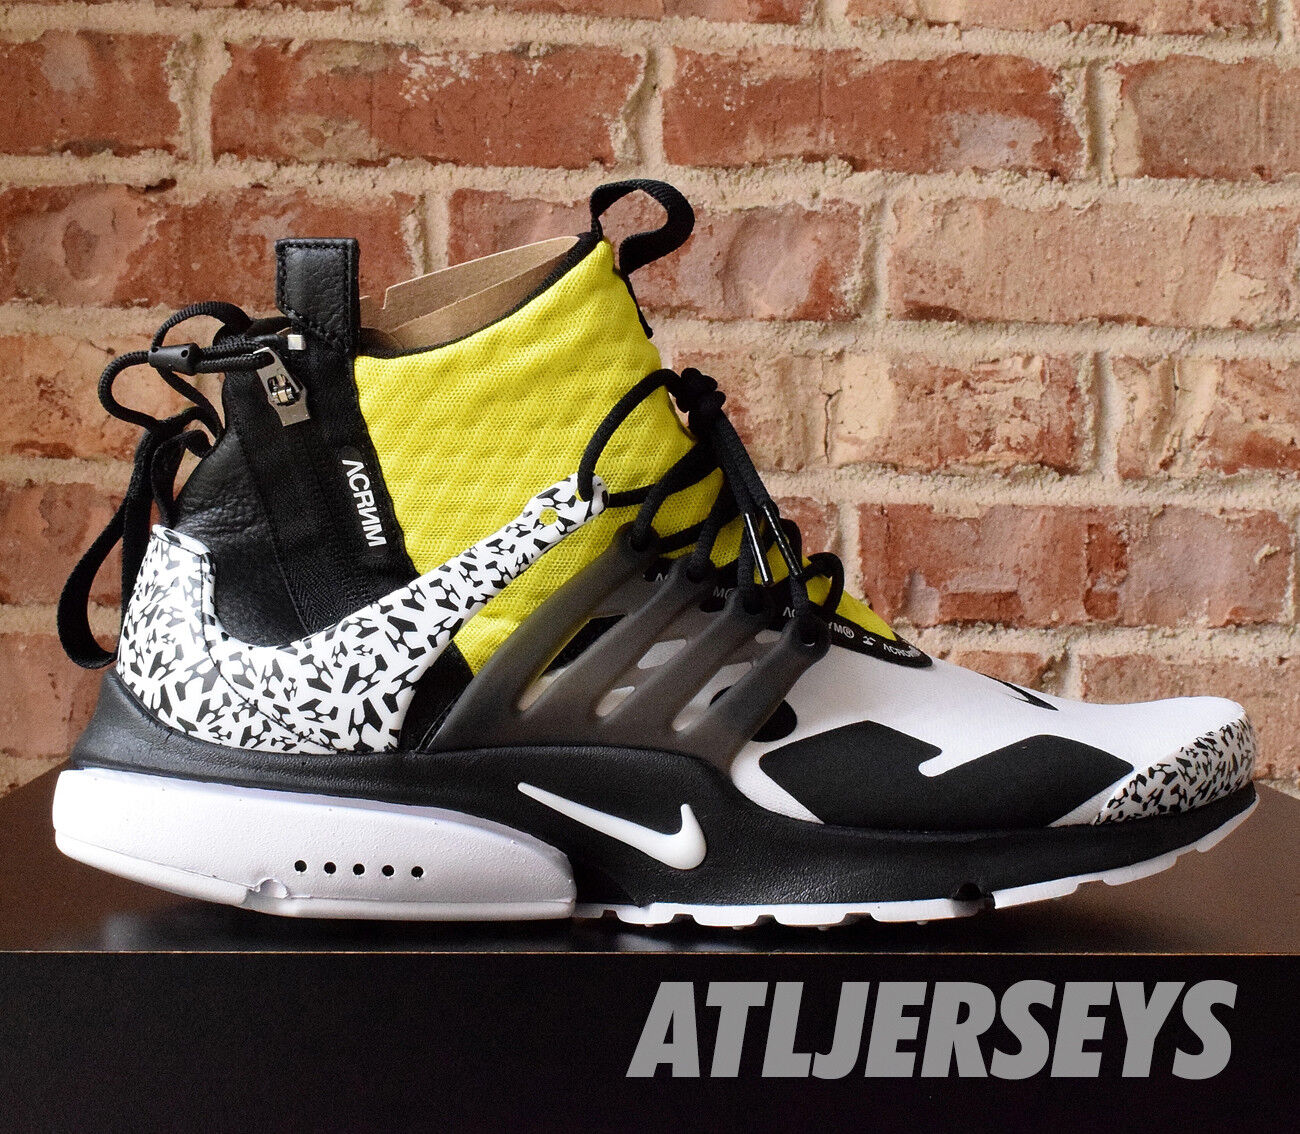 Nike Air Presto Mid Acronym Dynamic Yellow Black White AH7832-100 Size 4-14